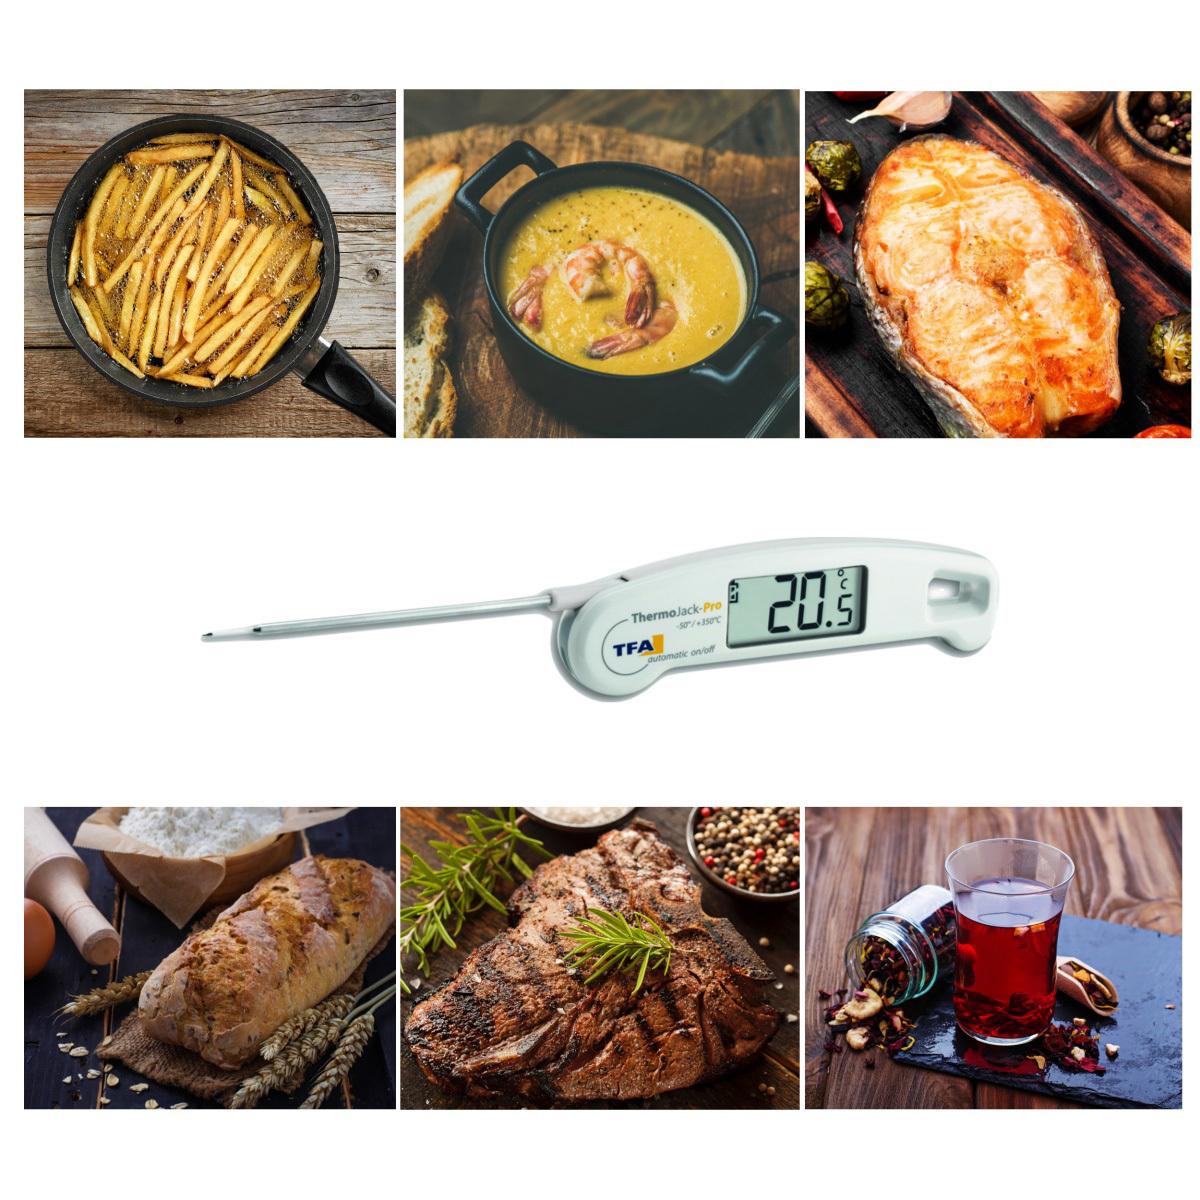 30-1050-02-digitales-einstich-thermometer-thermo-jack-pro-anwendung-1200x1200px.jpg